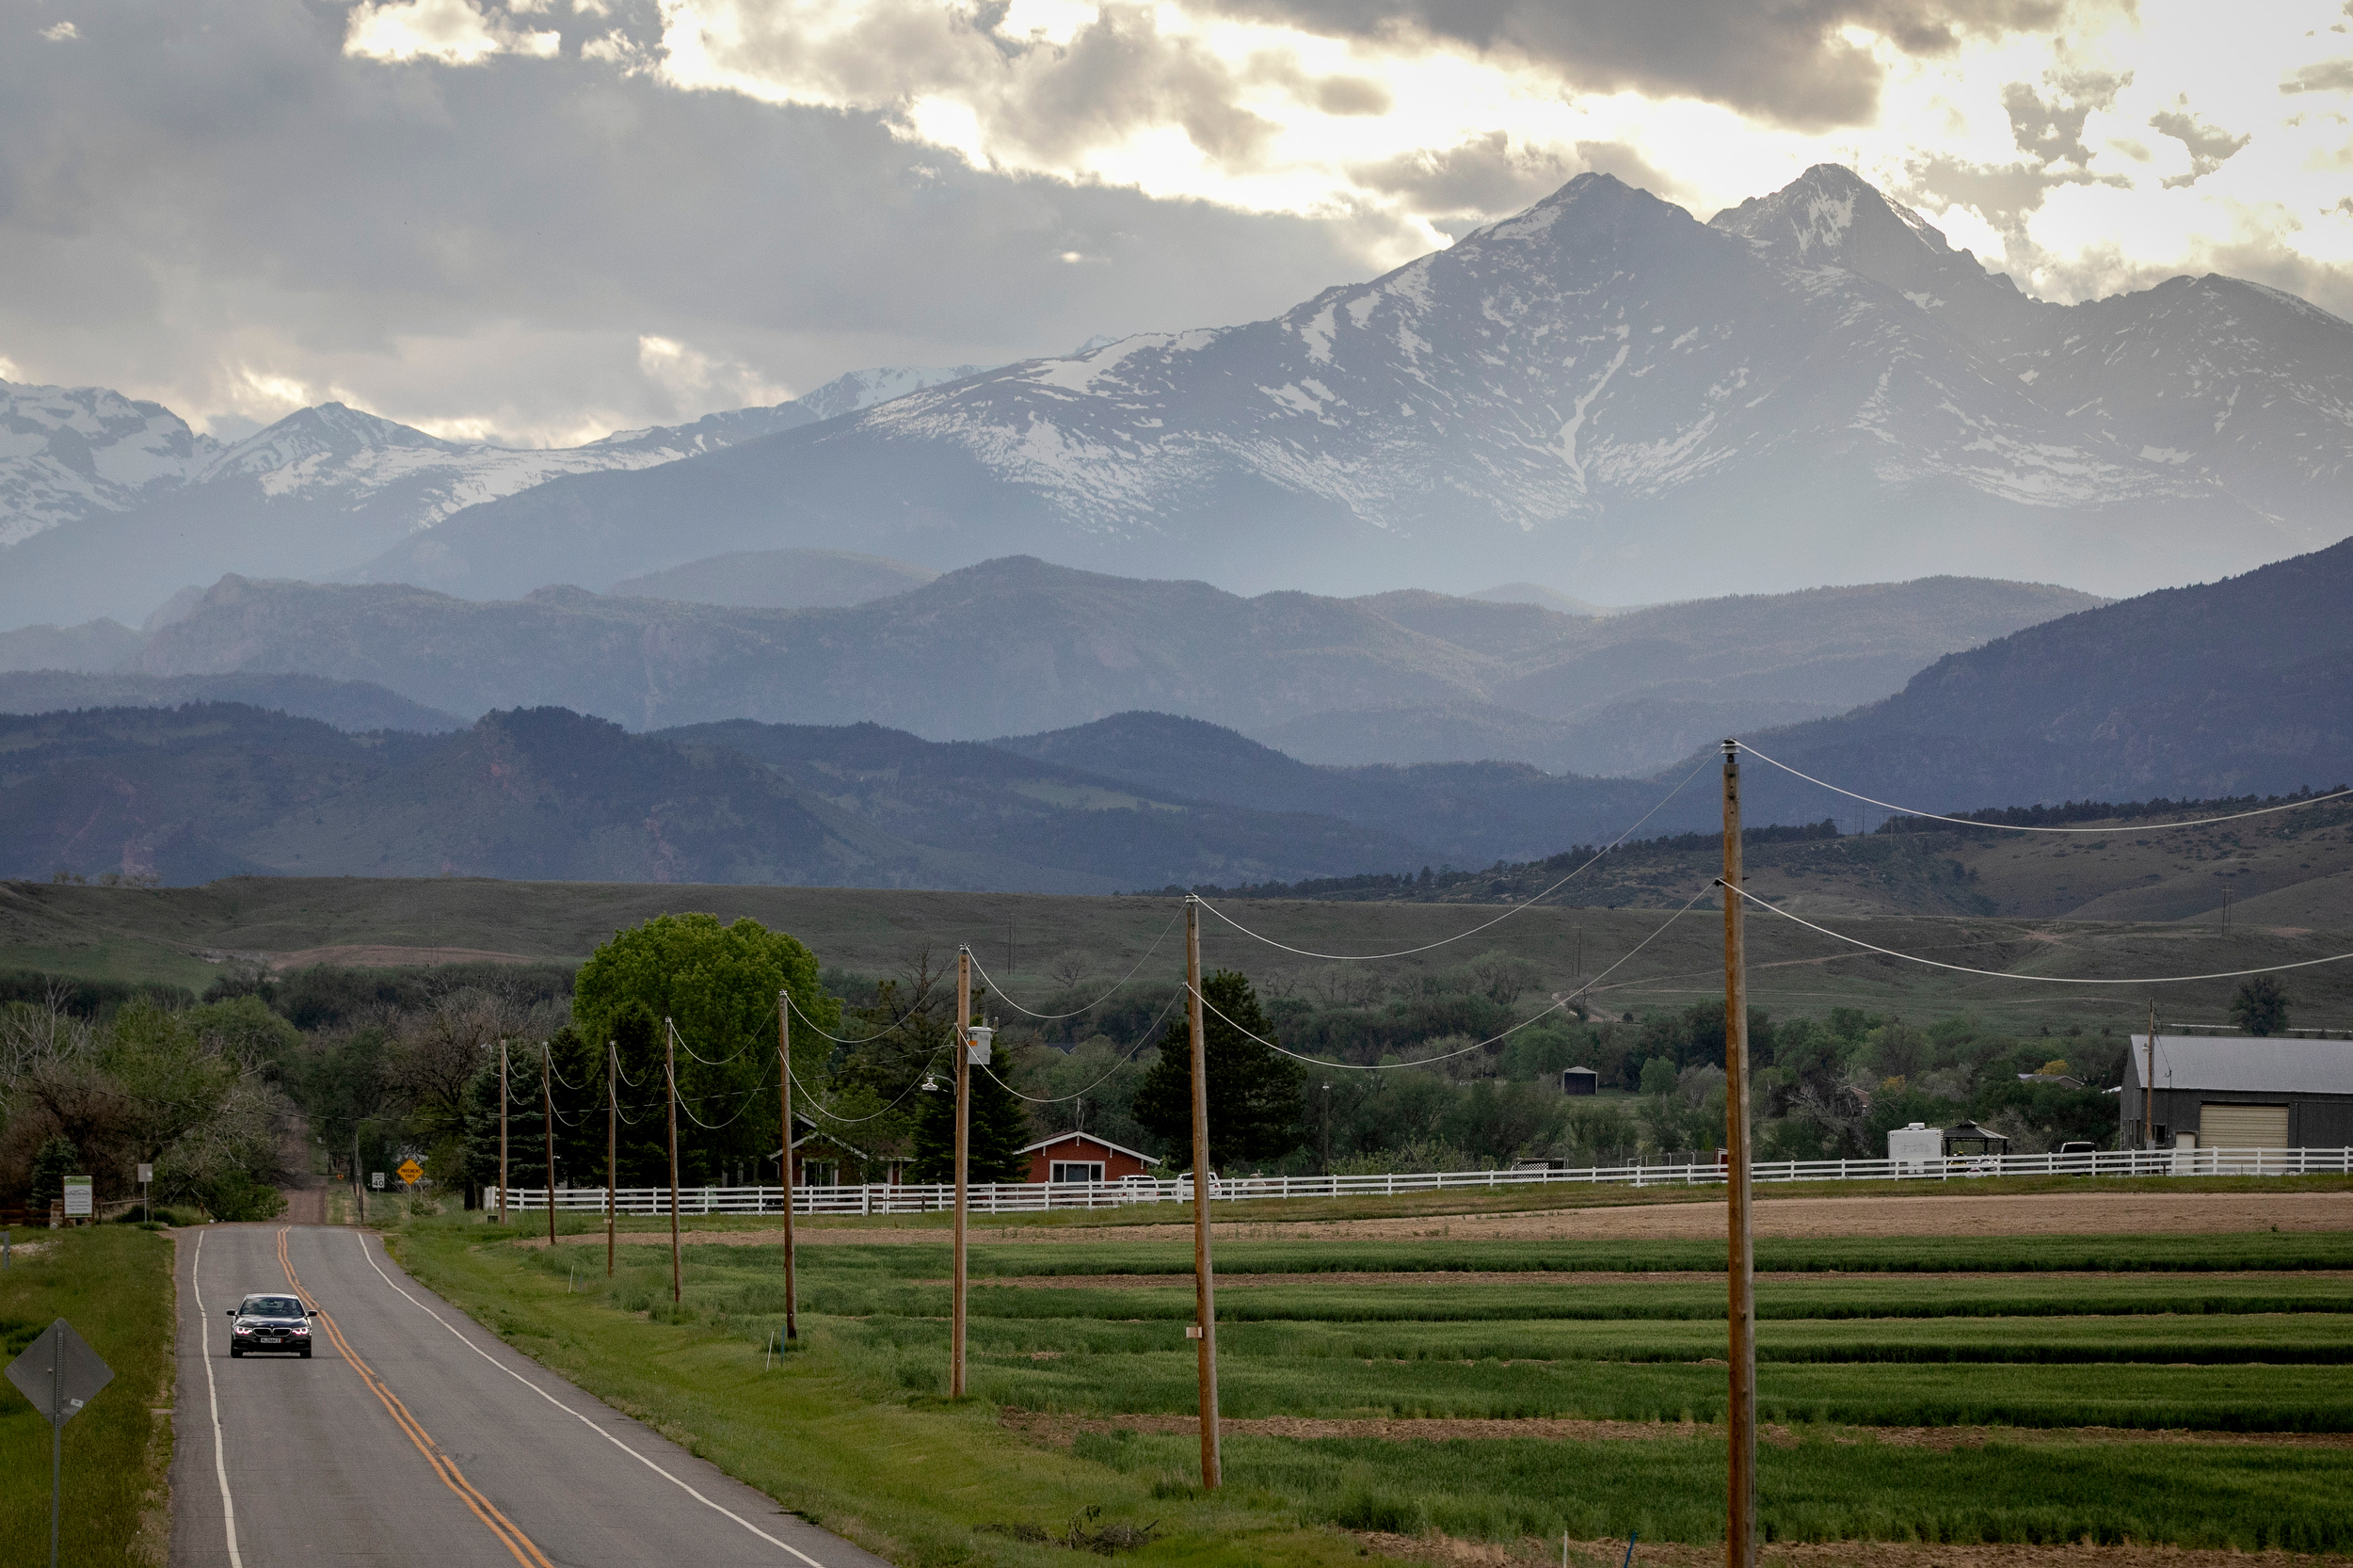 Fourteener Longs Peak Mountain Looms Over Farmland Near Berthoud